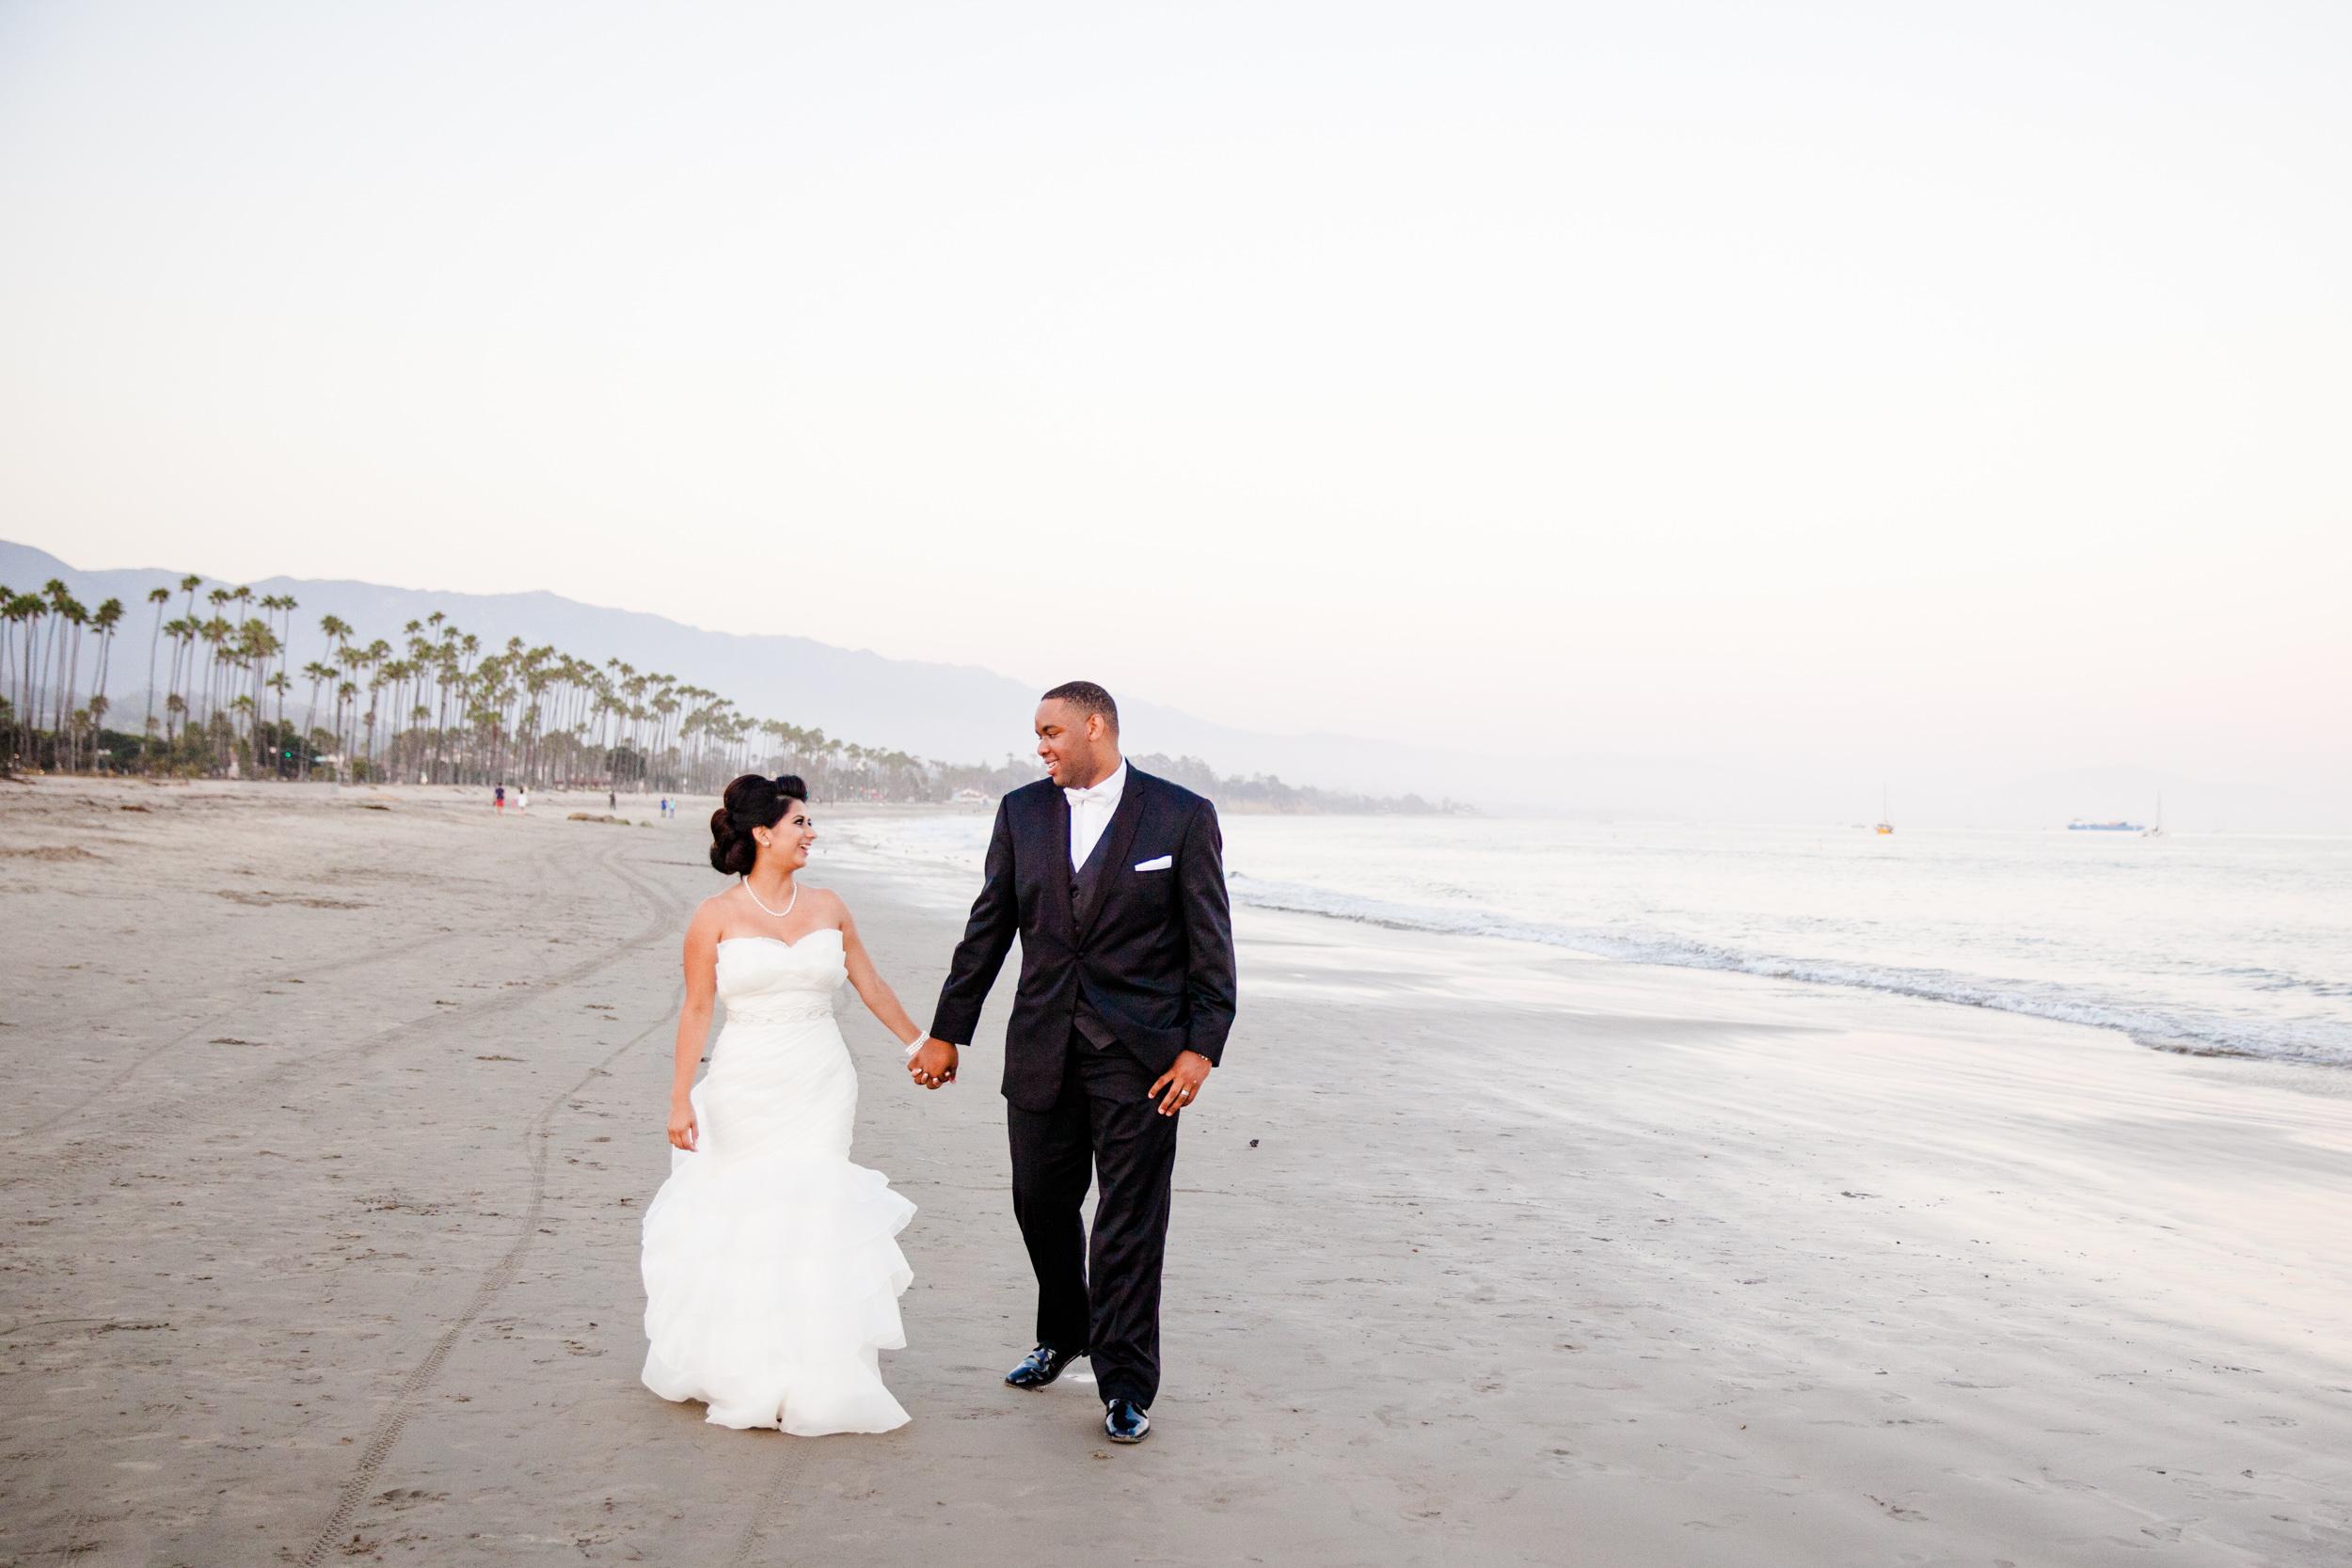 23--jewel-maree-photography-wedding.jpg